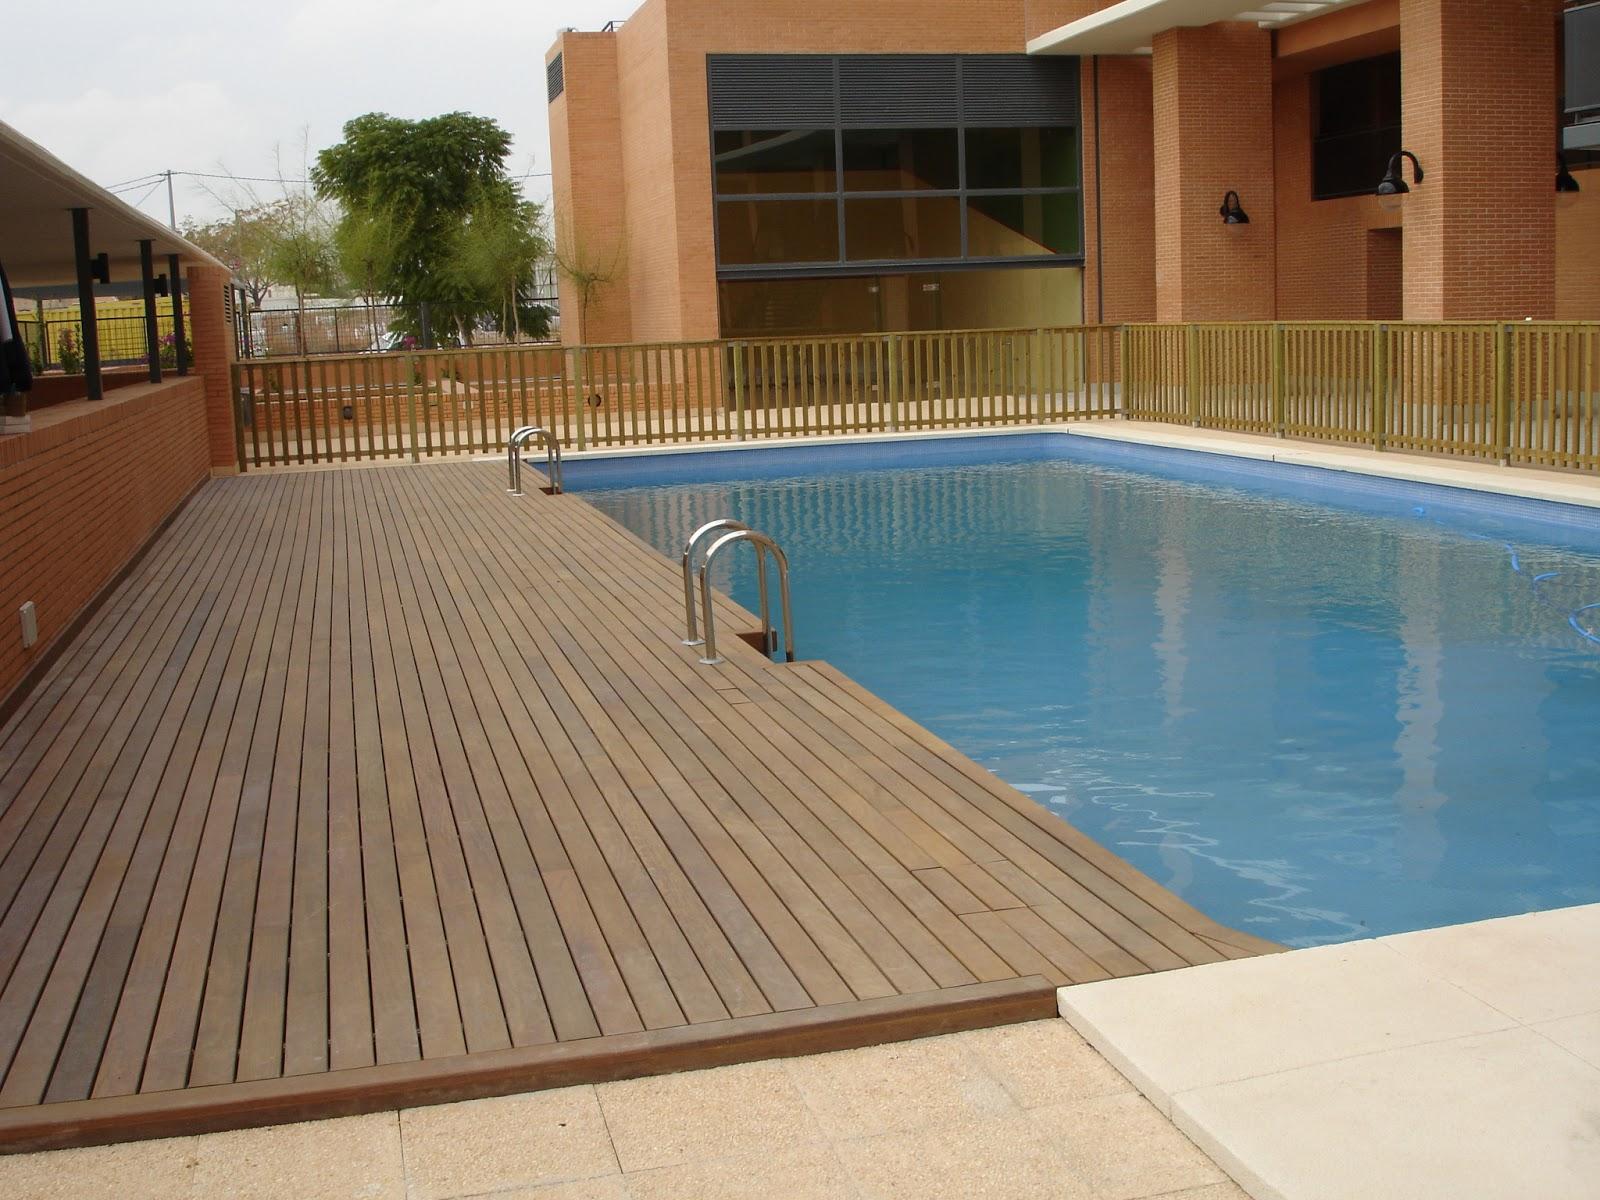 Indagua sauco coronaci n piscina for Coronacion de piscinas